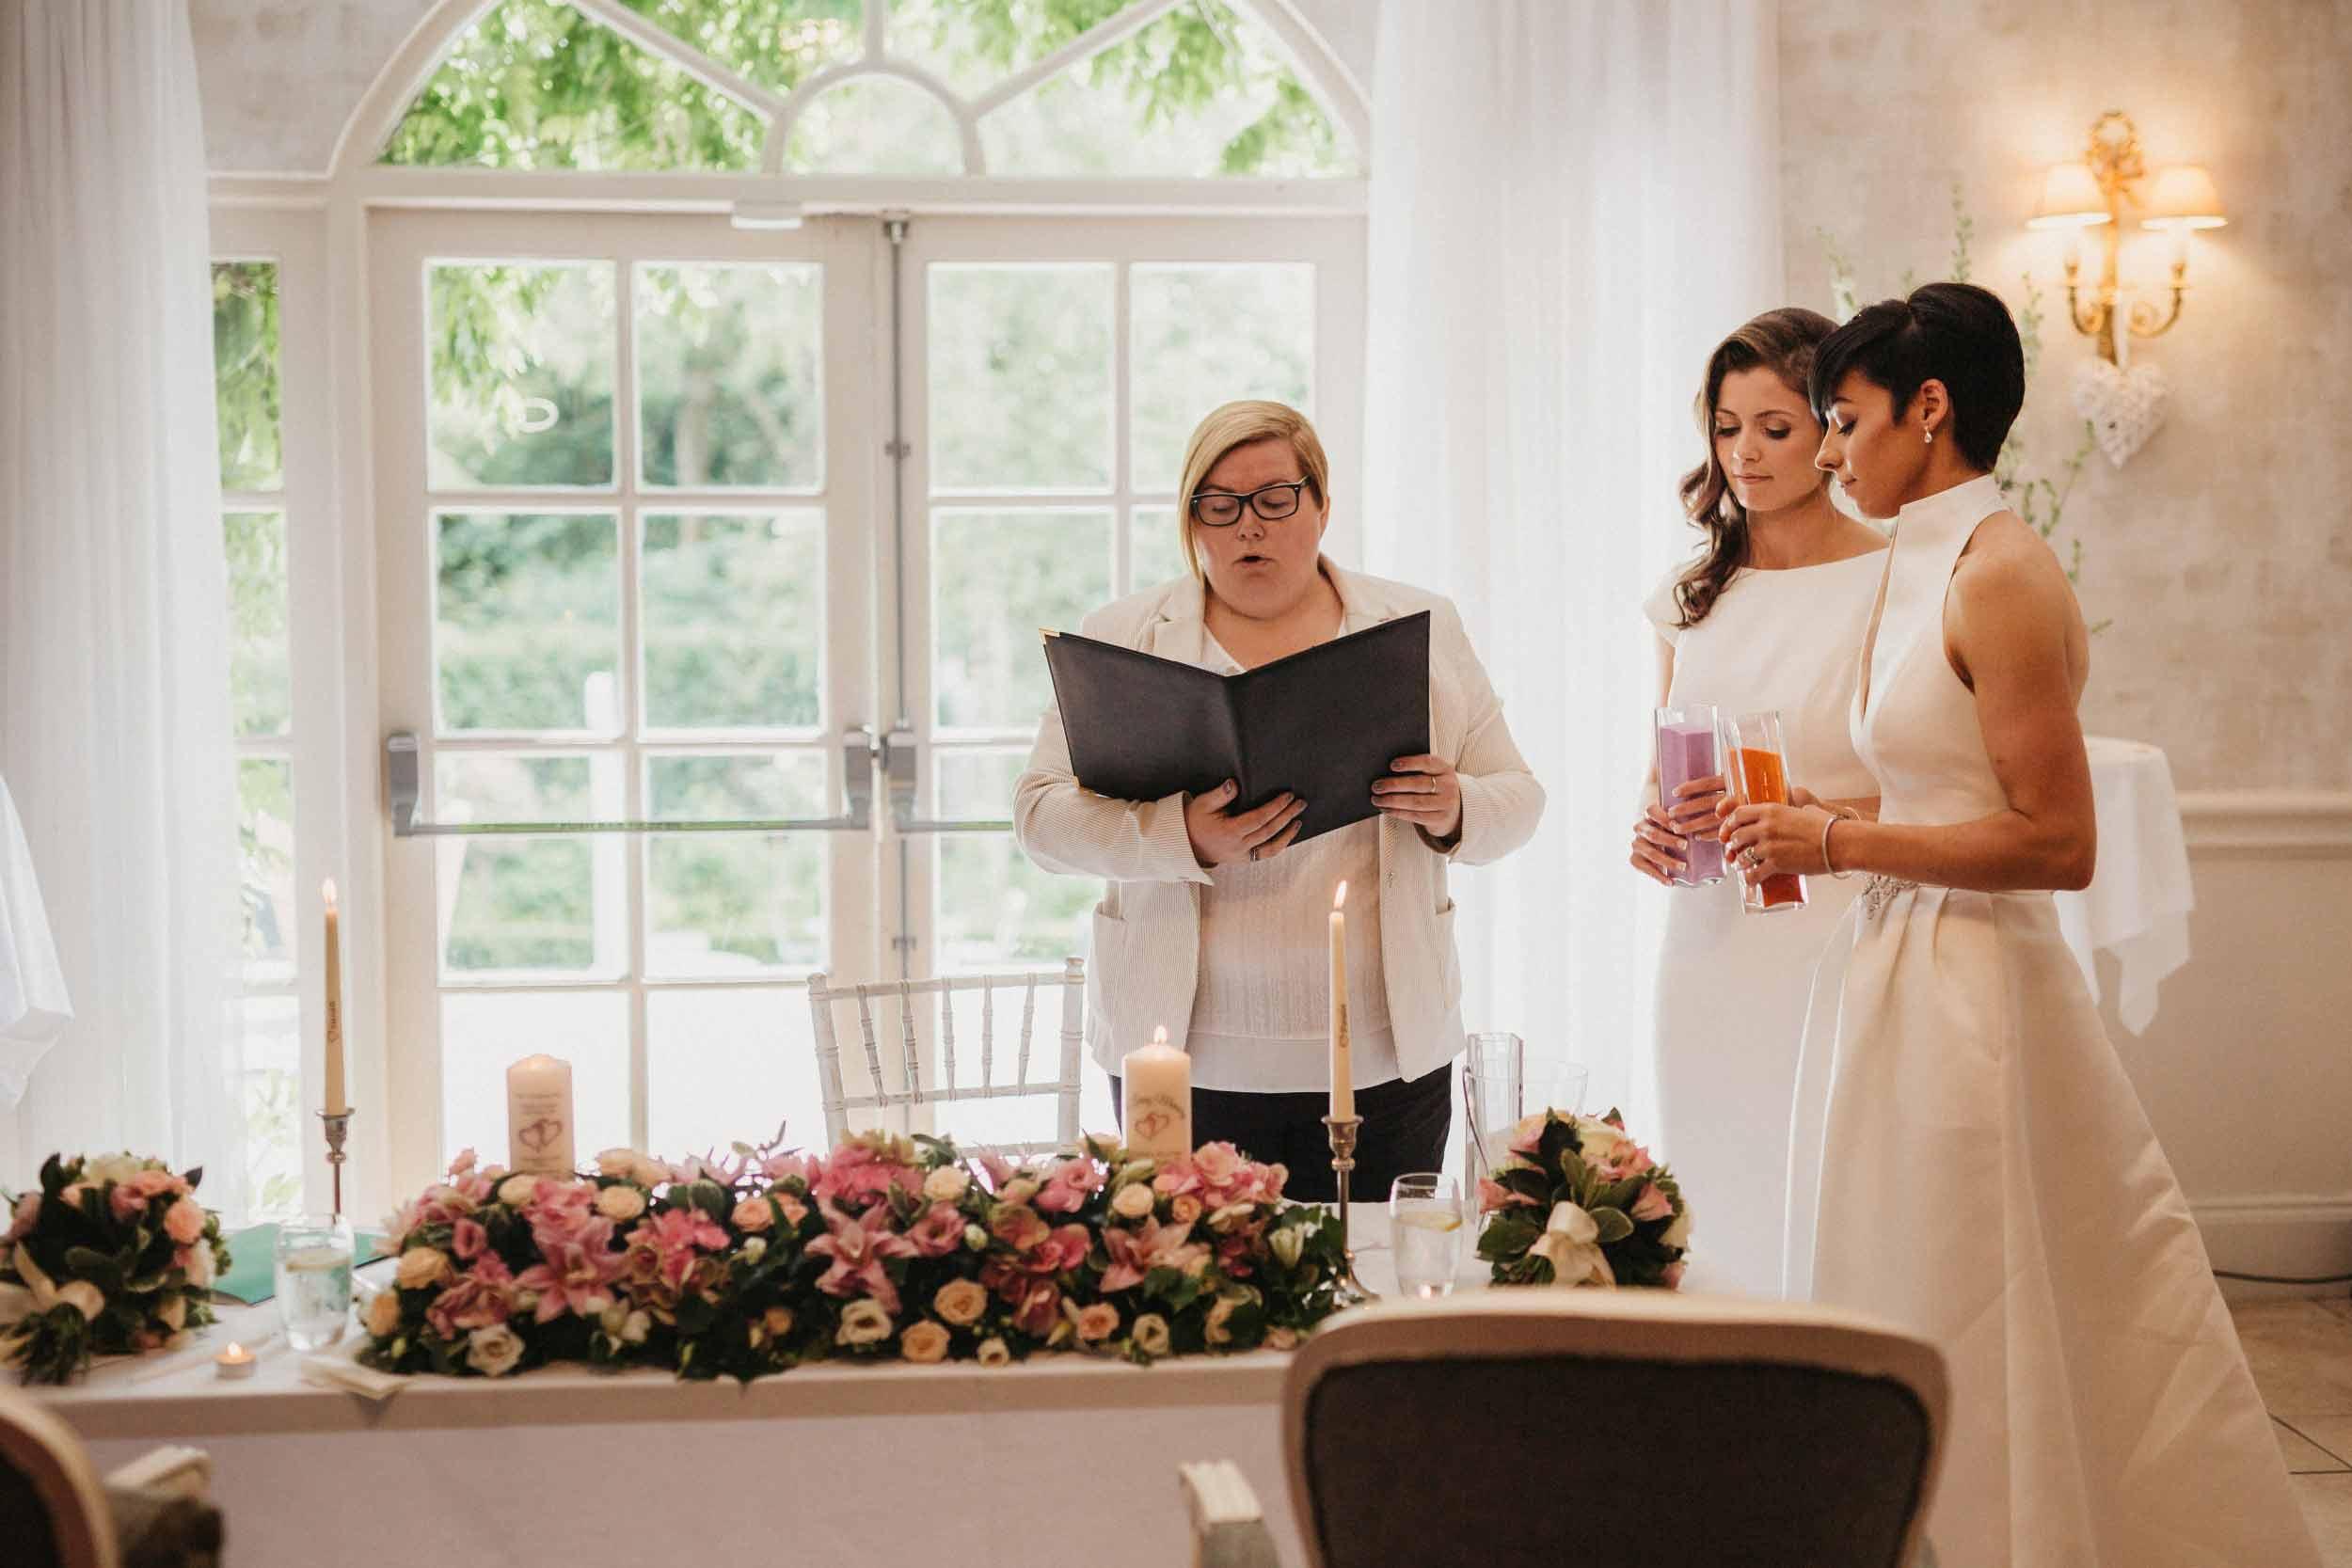 Wedding Celebrant Marriage